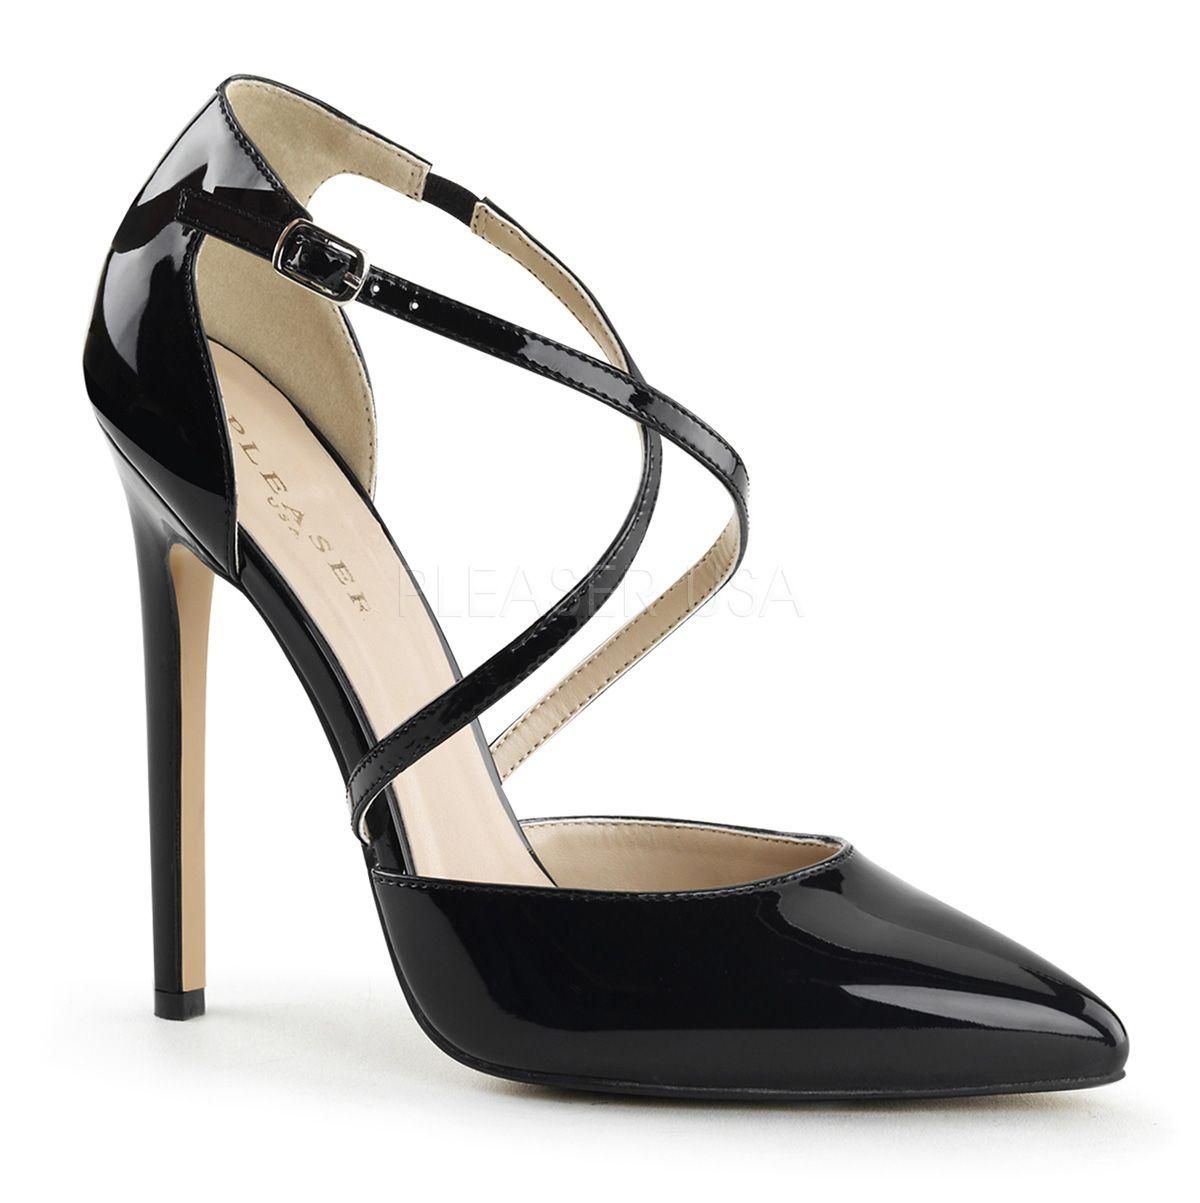 Chaussures Pleaser noires homme OKAS9P